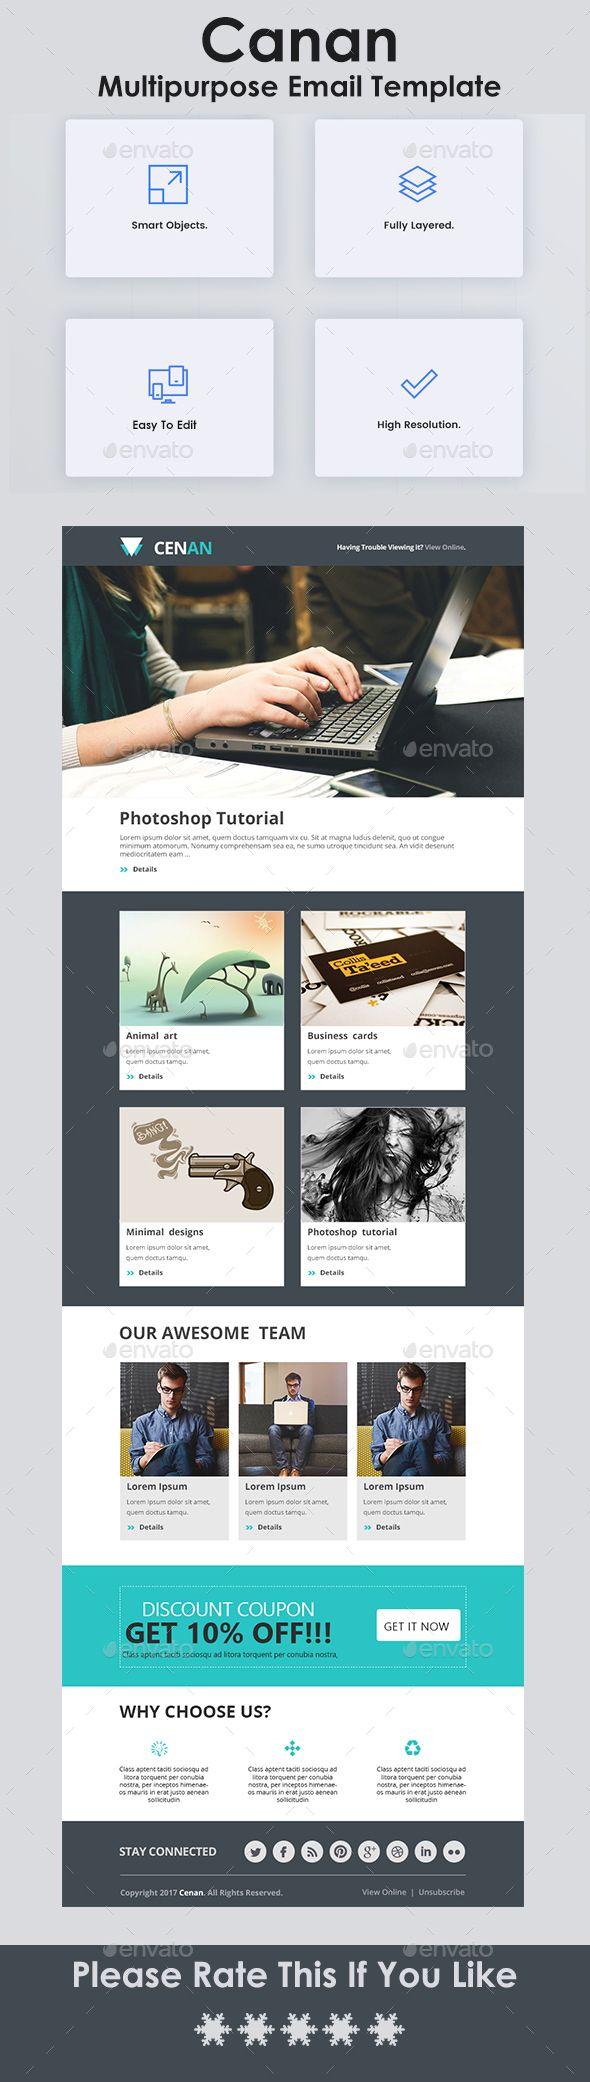 Multipurpose Email Template   Pinterest   Template, Newsletter ...